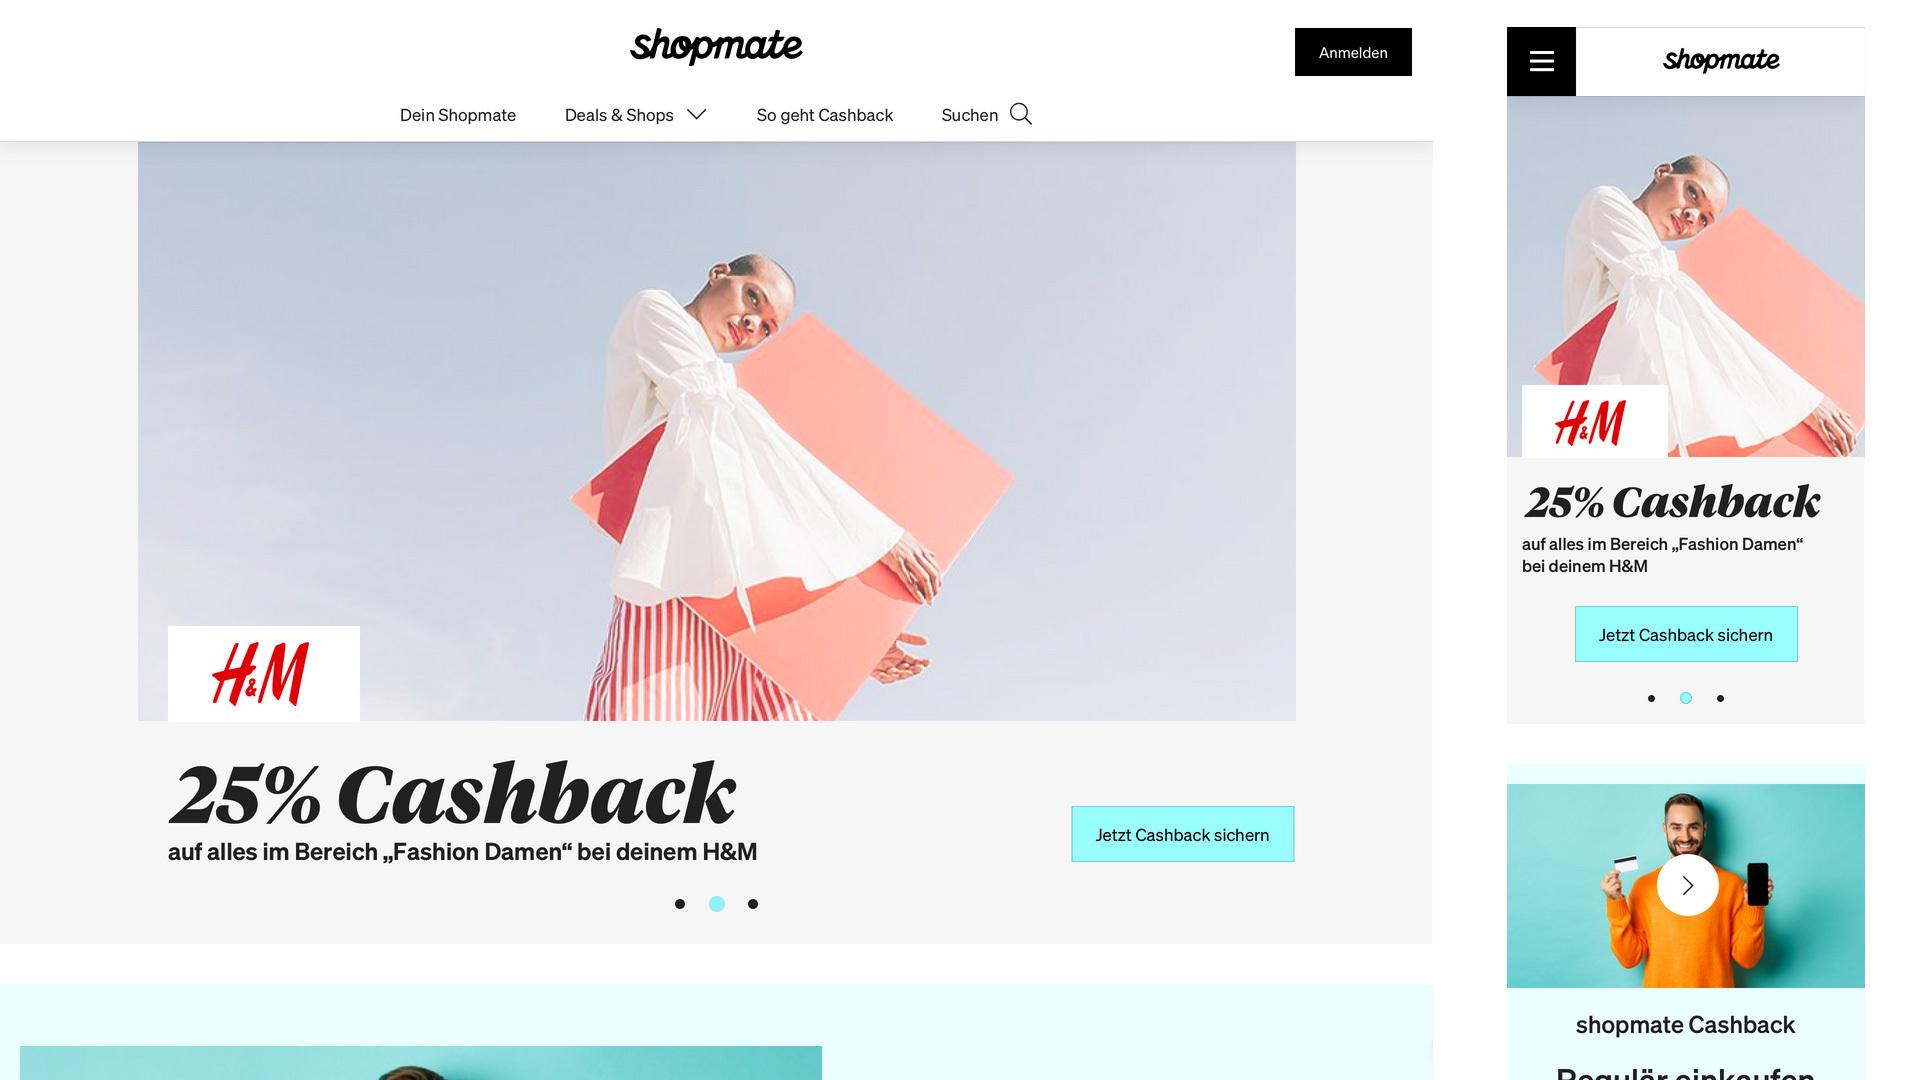 Screenshot des Cashback Portals Shopmate